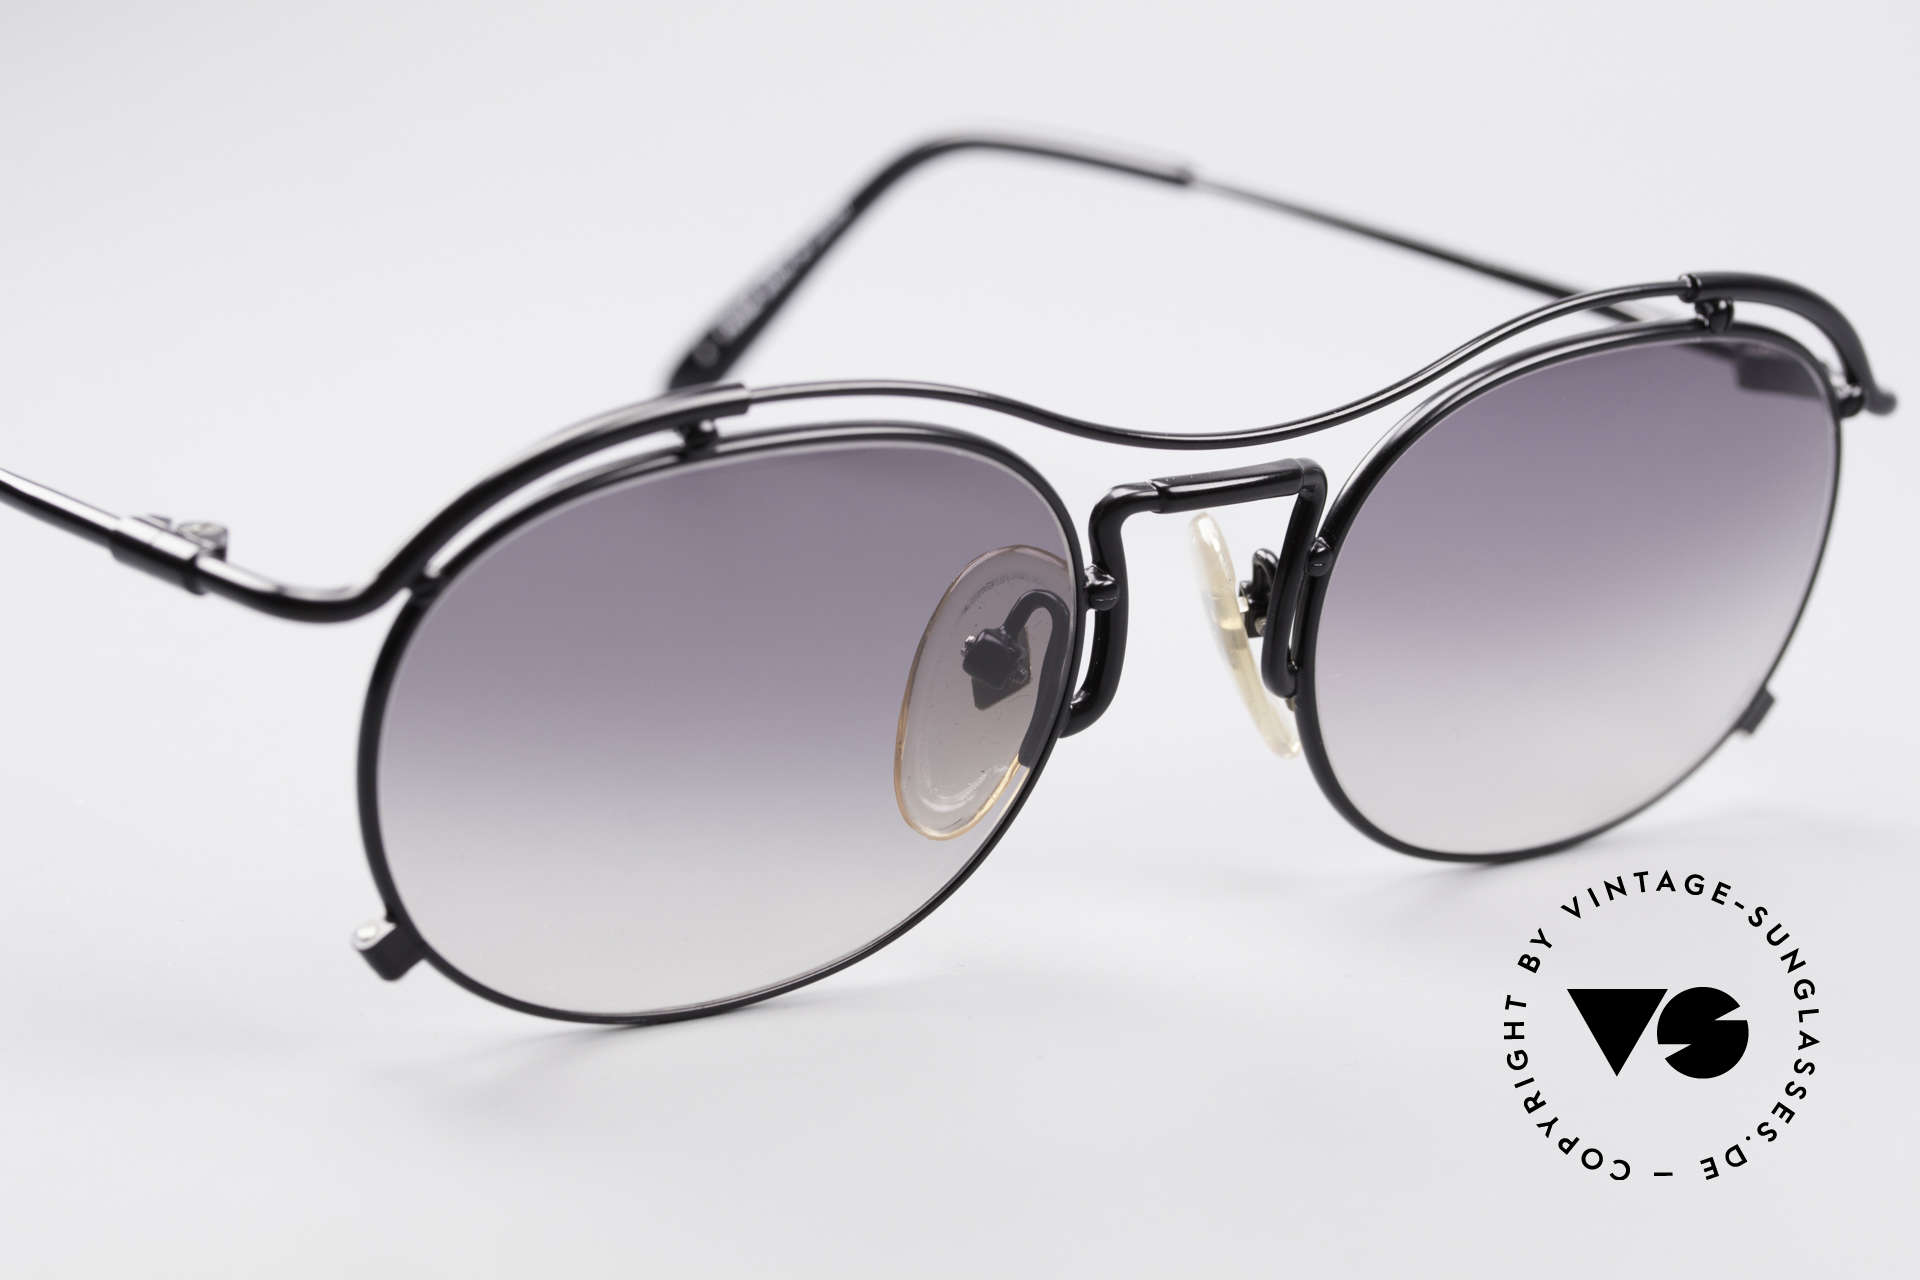 Jean Paul Gaultier 55-2170 Vintage JPG Sunglasses, unworn (like all our old 90's designer sunglasses), Made for Men and Women